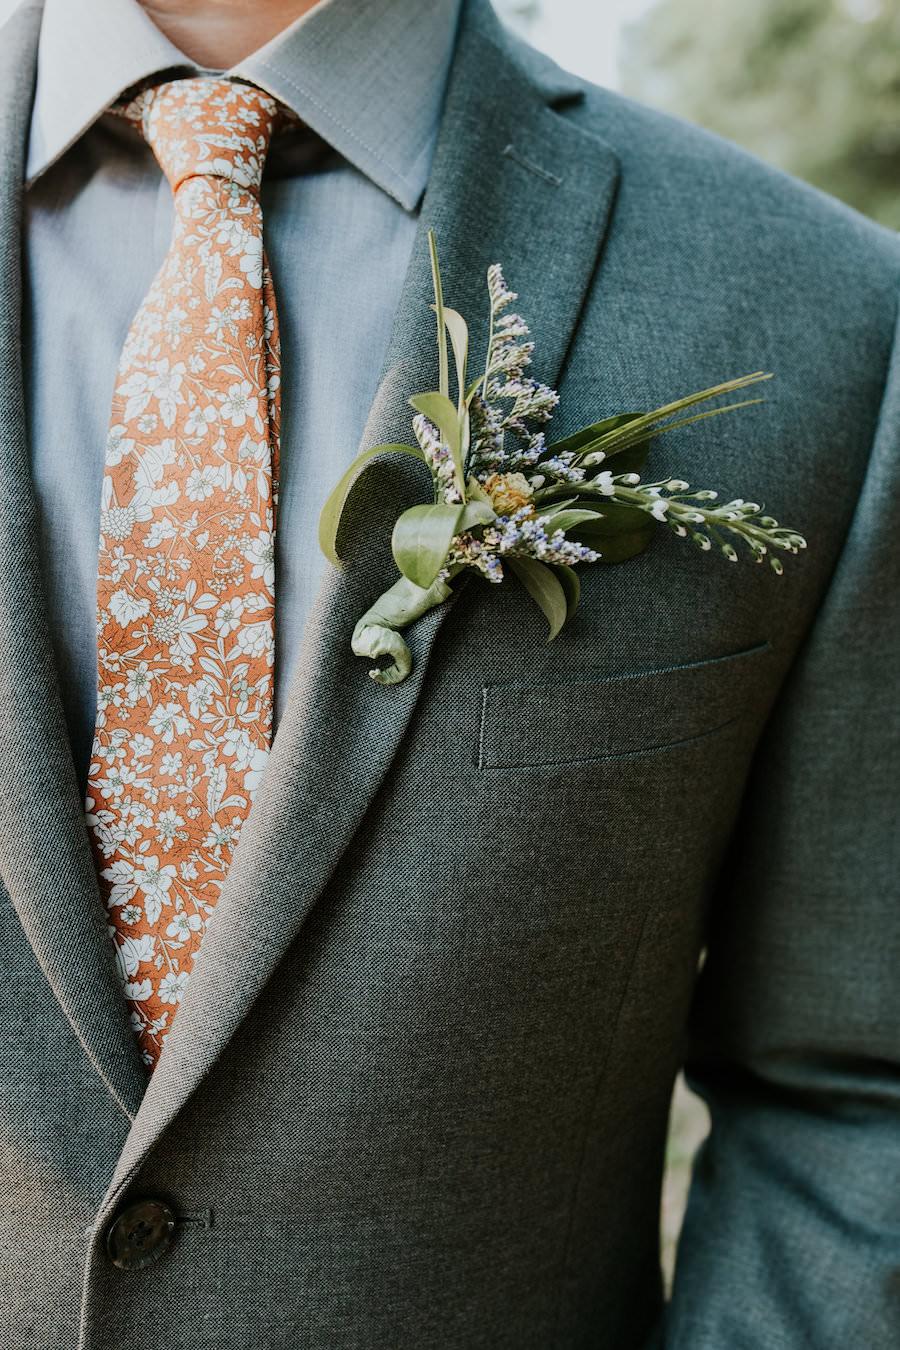 Greenery and Lavender Wedding Boutonniere with Orange Groomsmen Tie   Retro Vintage Boho Wedding Inspiration   Tampa Wedding Florist Northside Florist